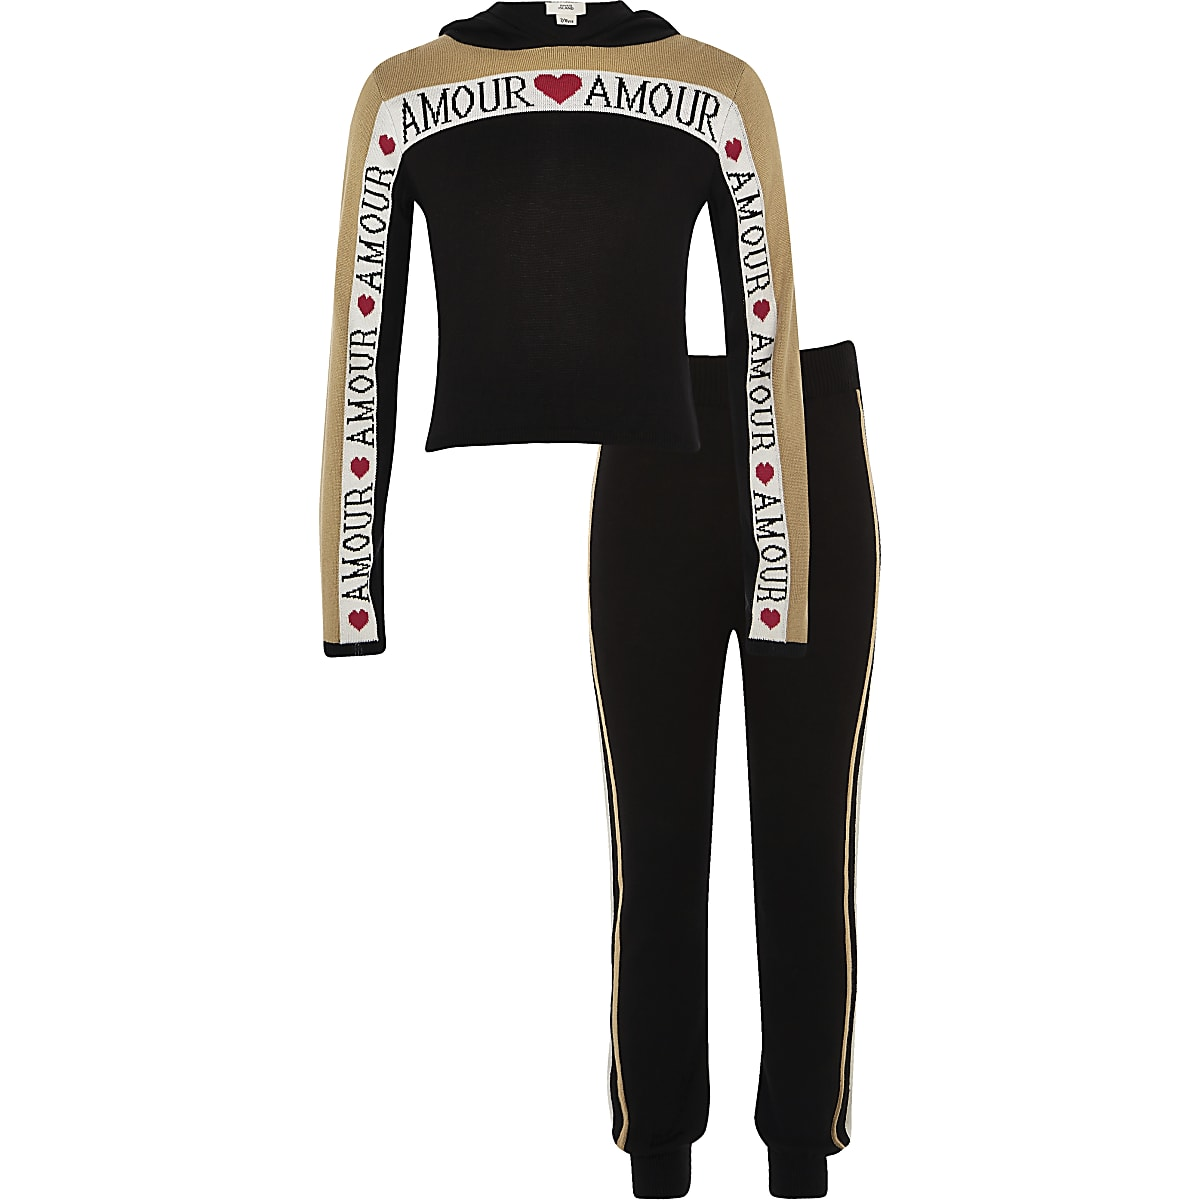 Zwarte gebreide hoodie-outfit met 'Amour'-print voor meisjes